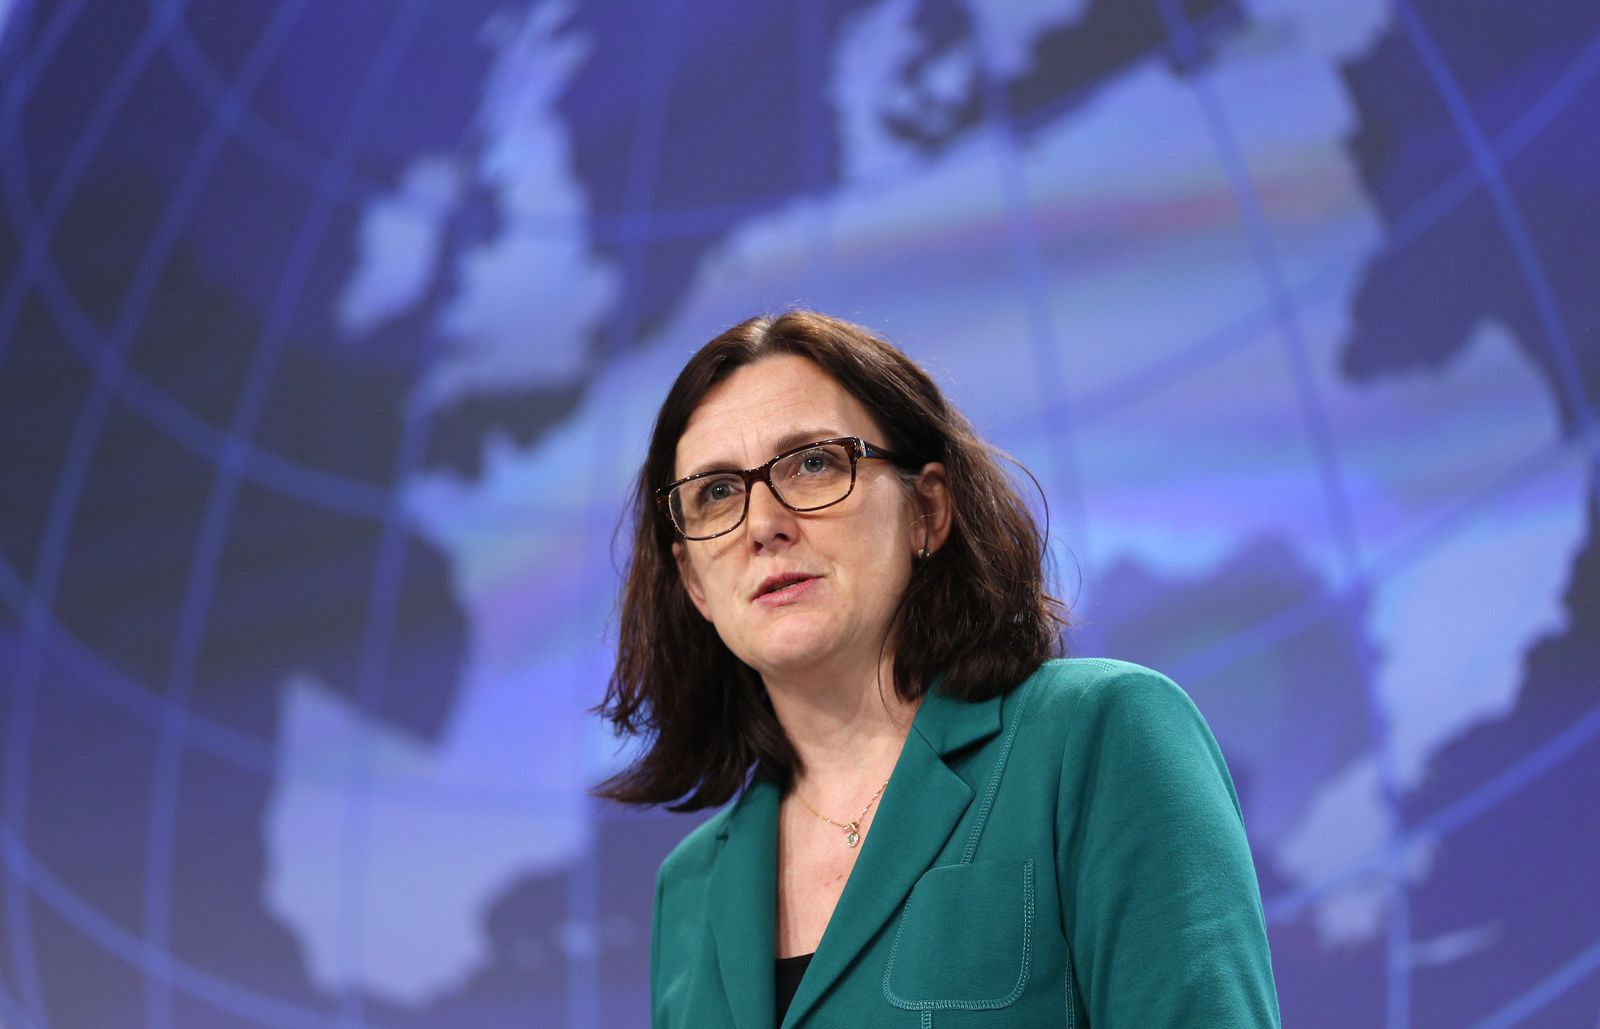 EU-Kommission 2014 / Cecilia Malmstrom